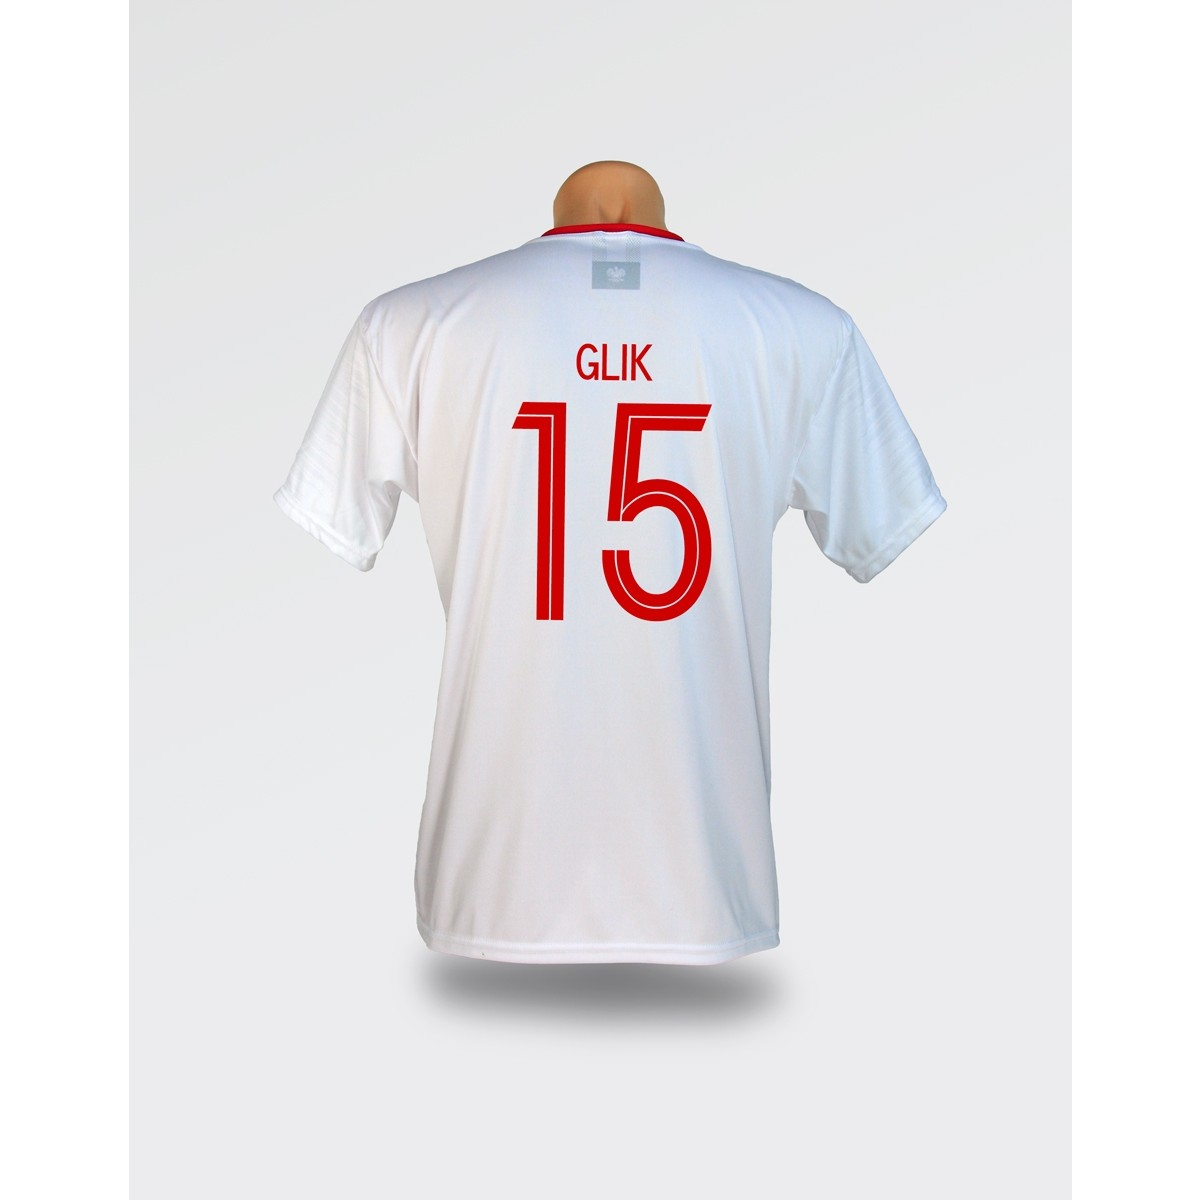 a23ec4fd98c3 Biała koszulka Polska - Glik